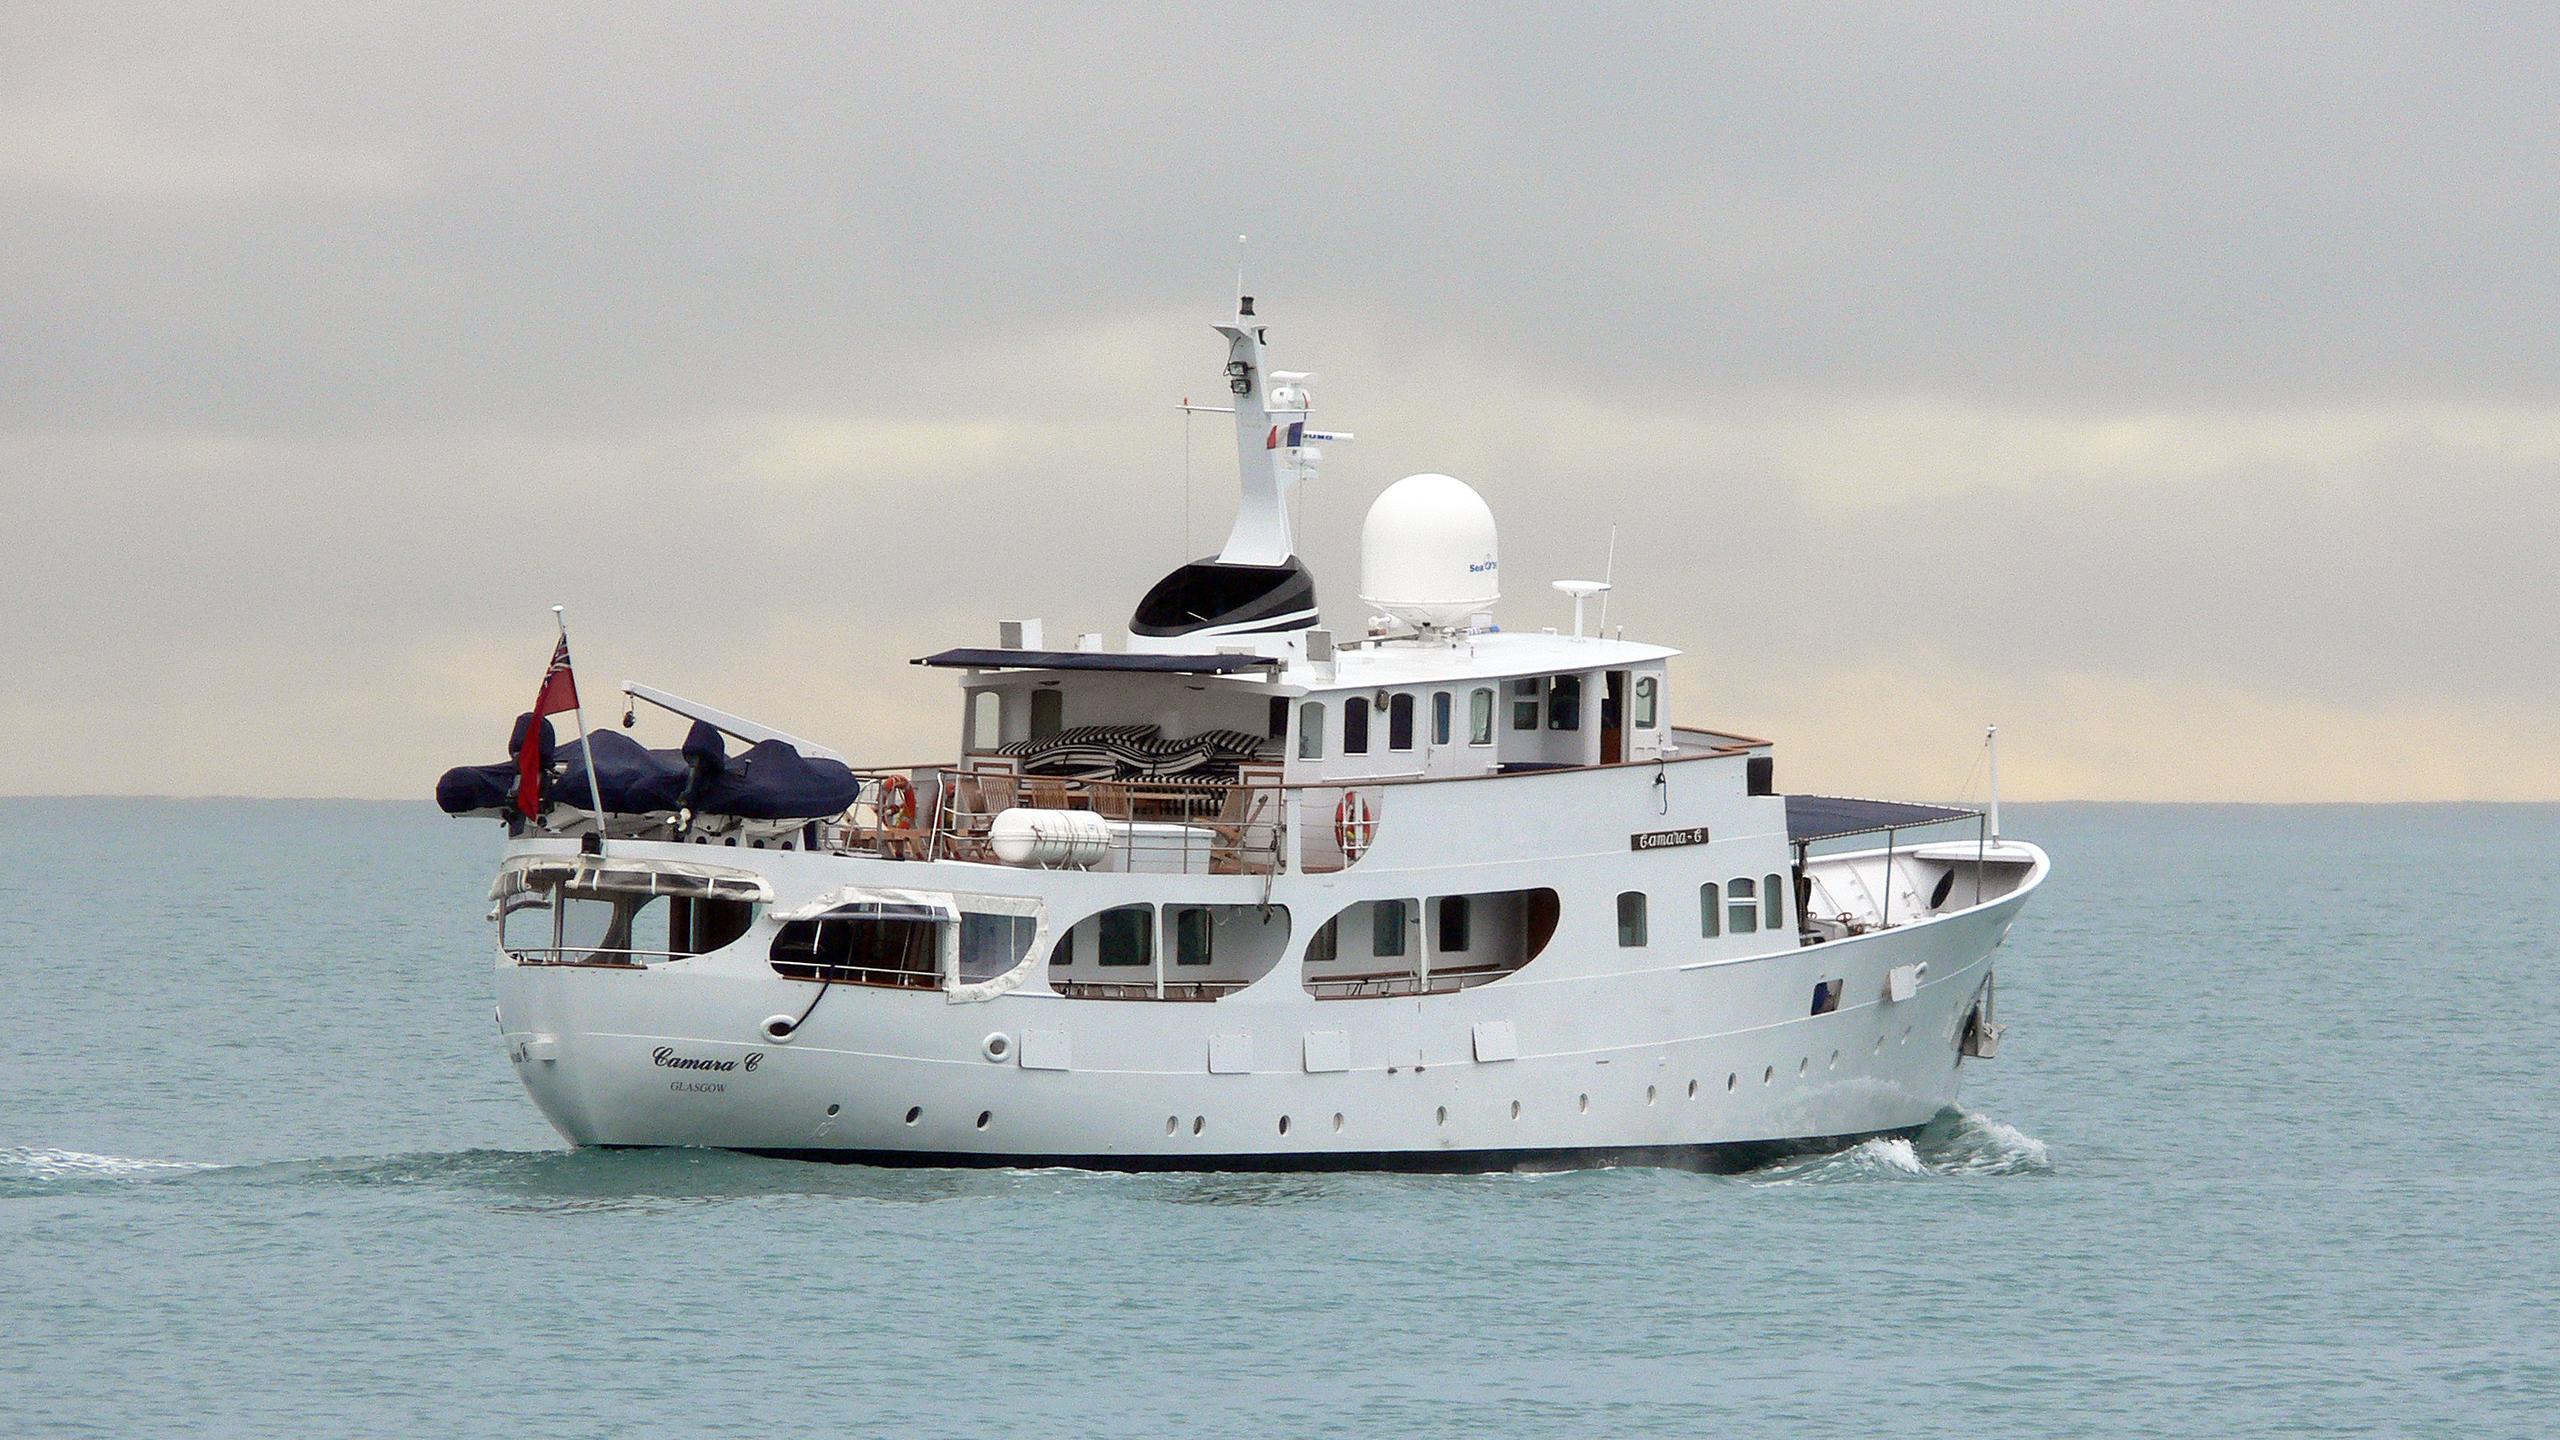 camara-c-motor-yacht-yarrow-1961-32m-stern-cruising